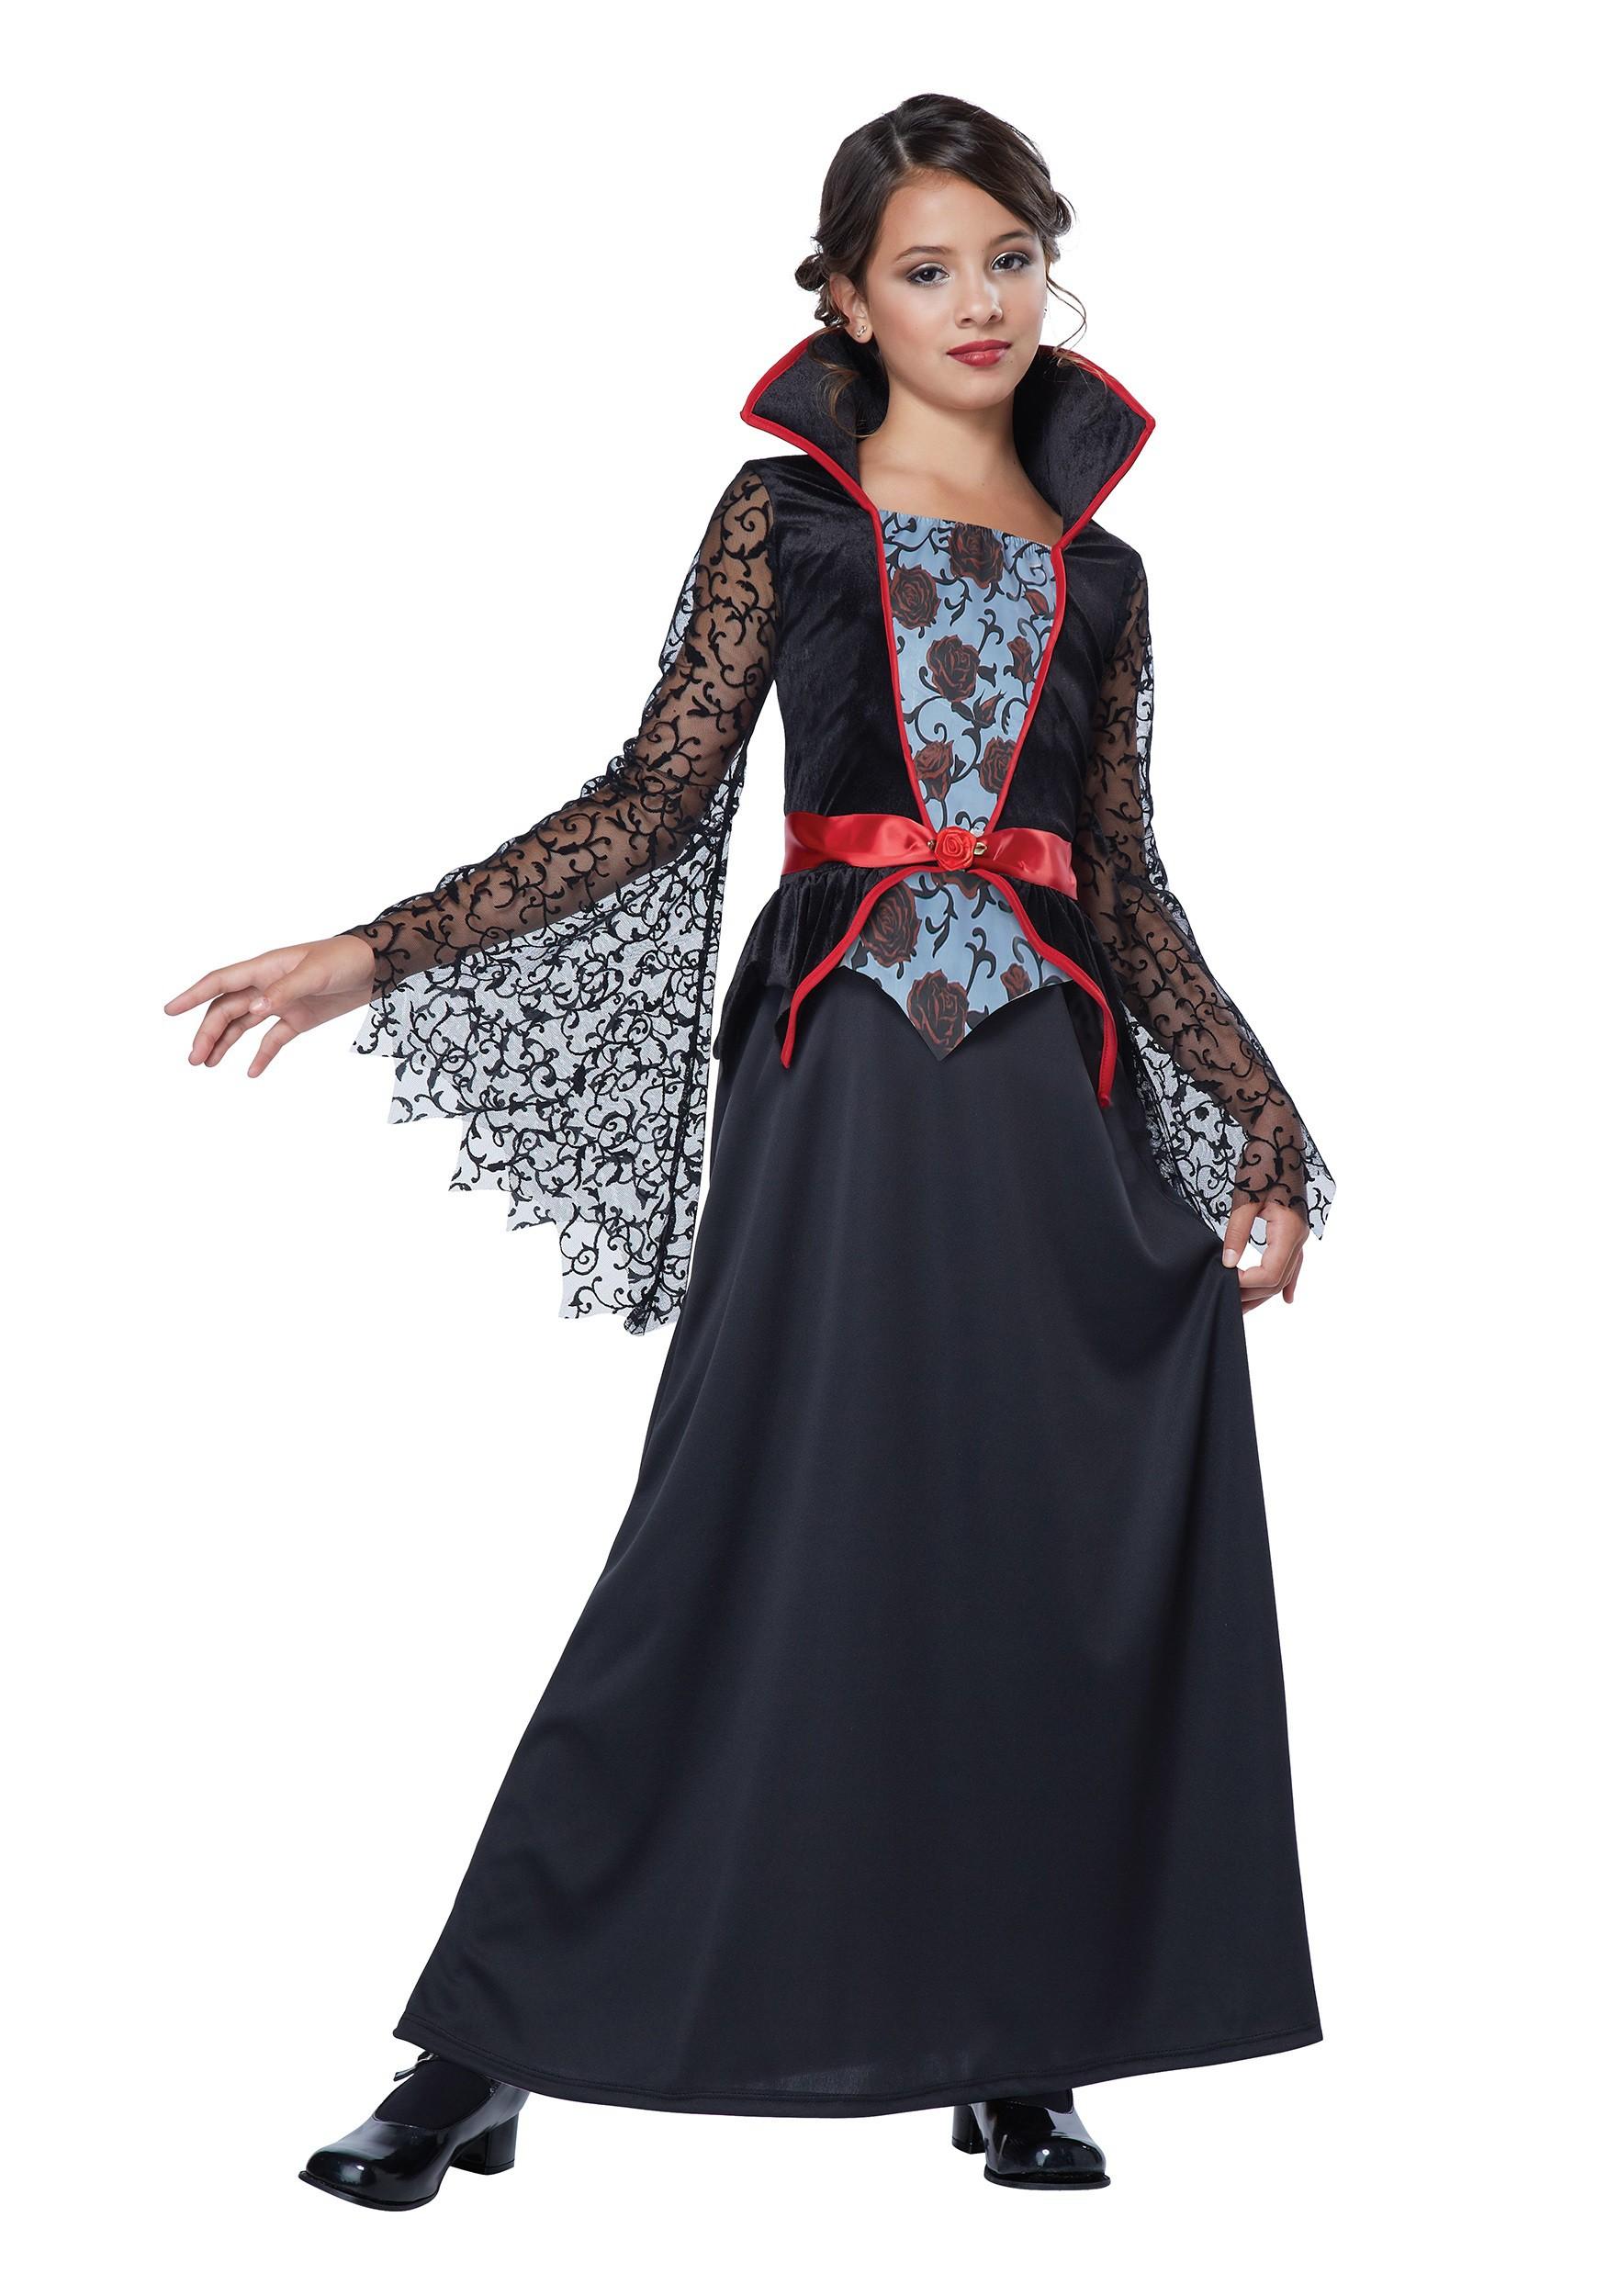 Coolest Baby Halloween Costumes